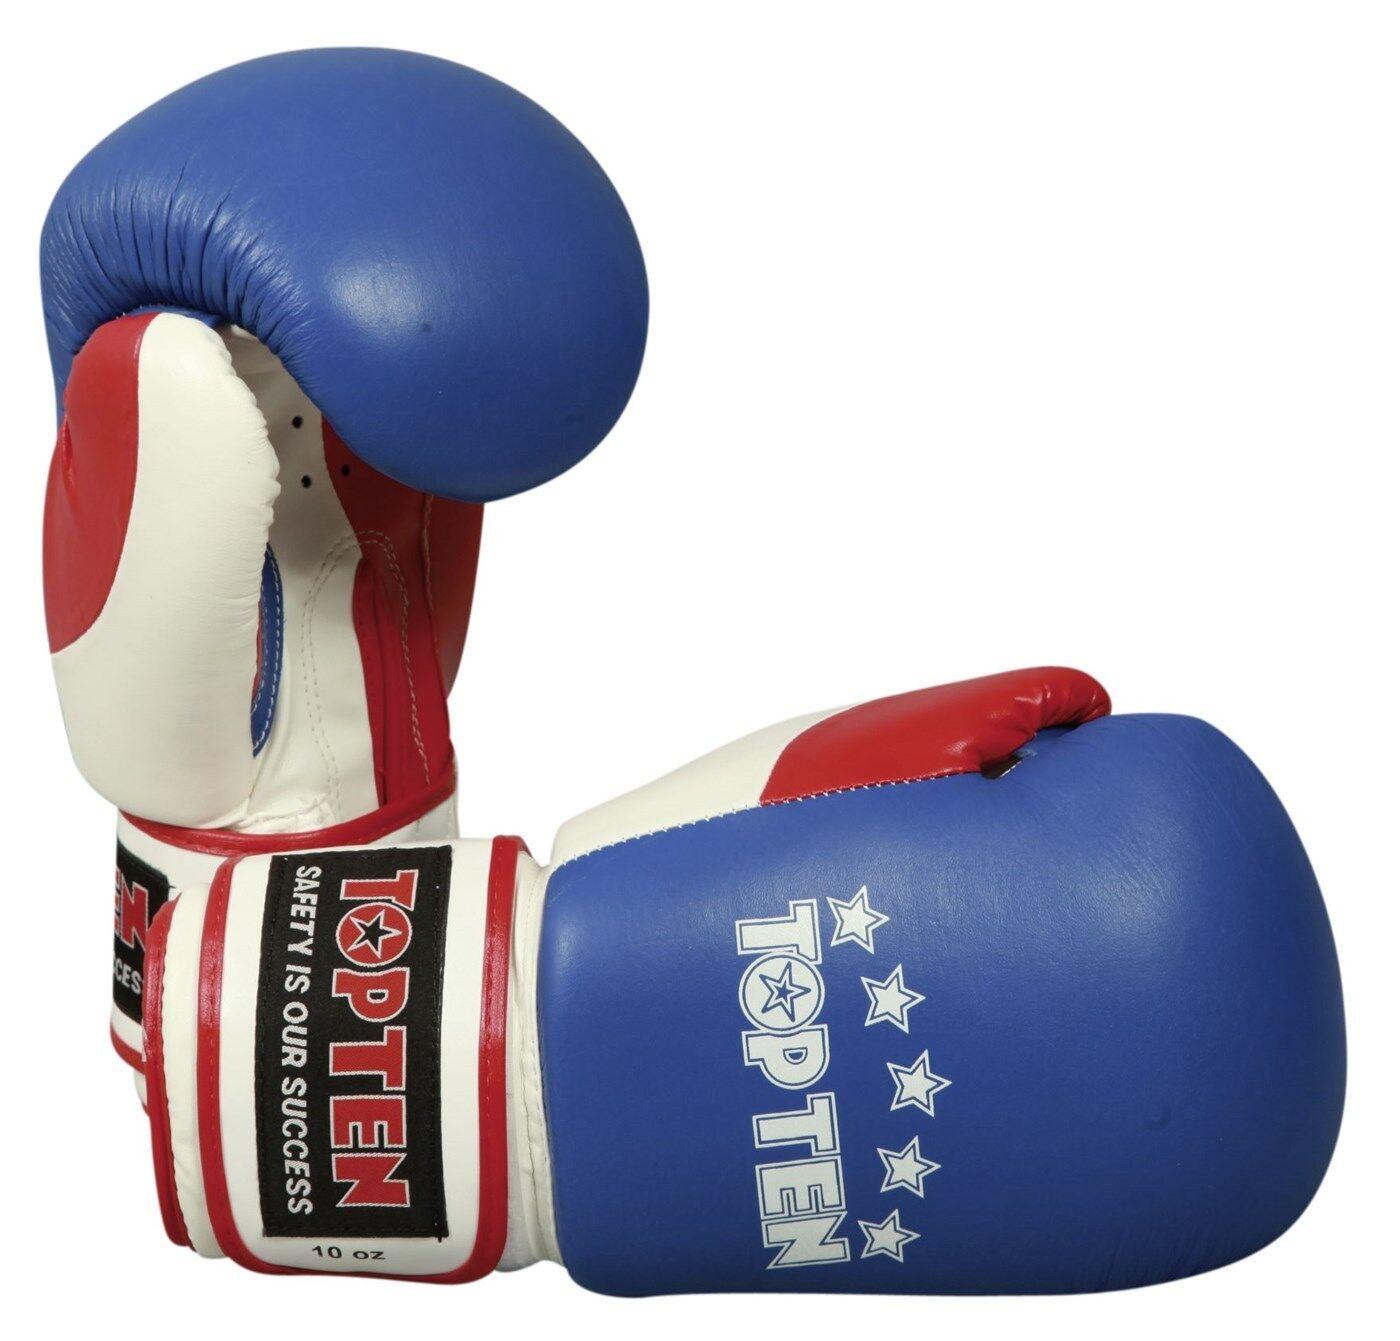 Boxhandschuh TOP TEN  FIGHT  10 Oz. blau rot weiß.  TriFarbe . Boxen. Kickboxen.